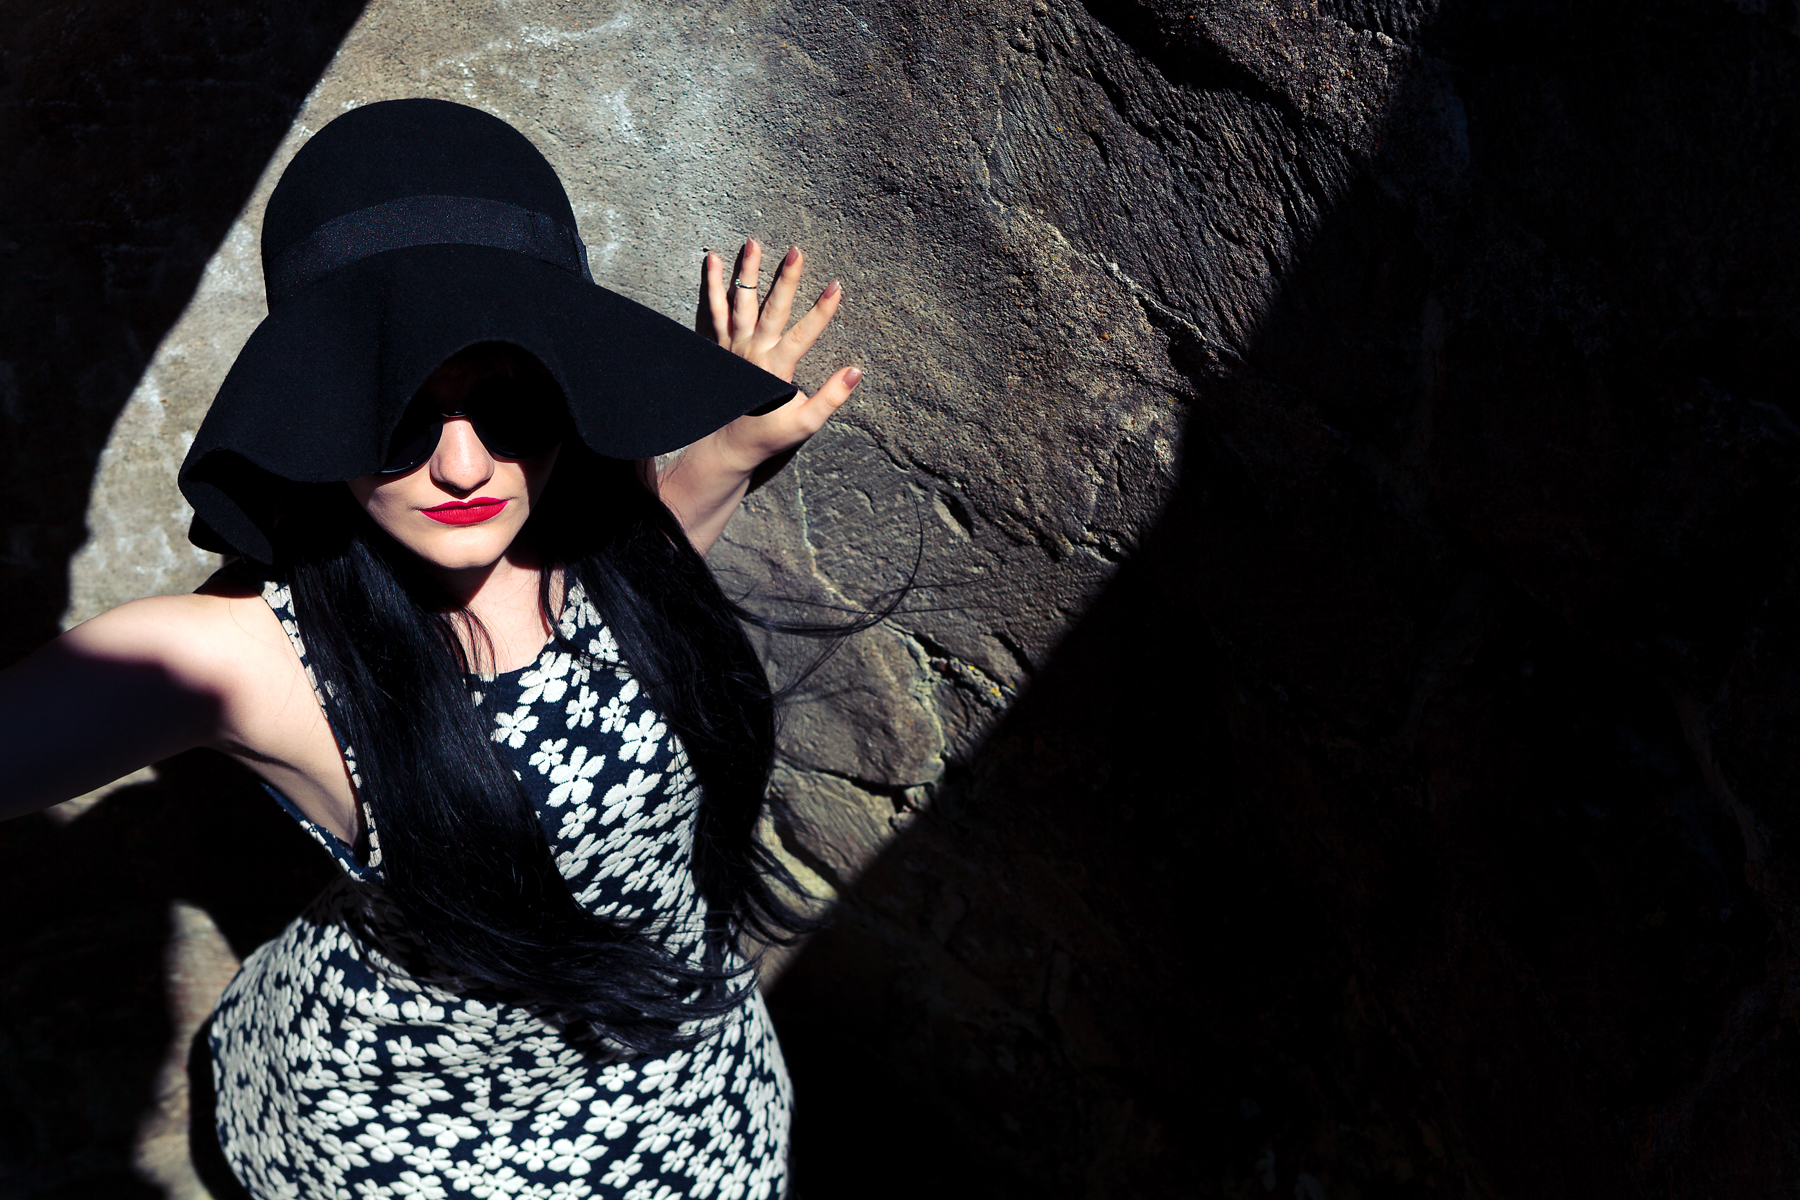 Woman in a hat in shadow